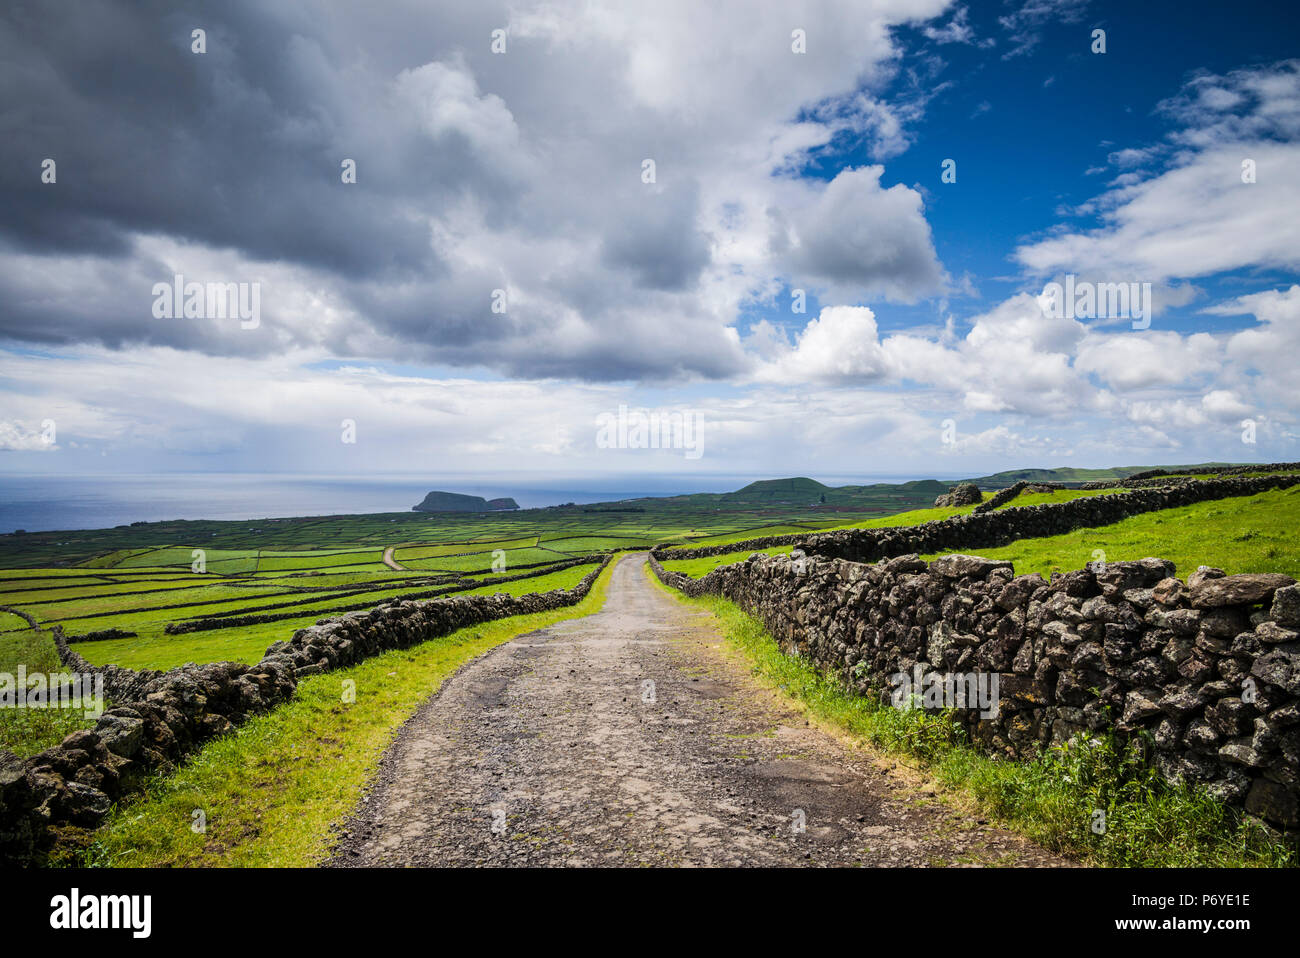 Portugal, Azores, Terceira Island, Serra do Cume, stone wall - Stock Image